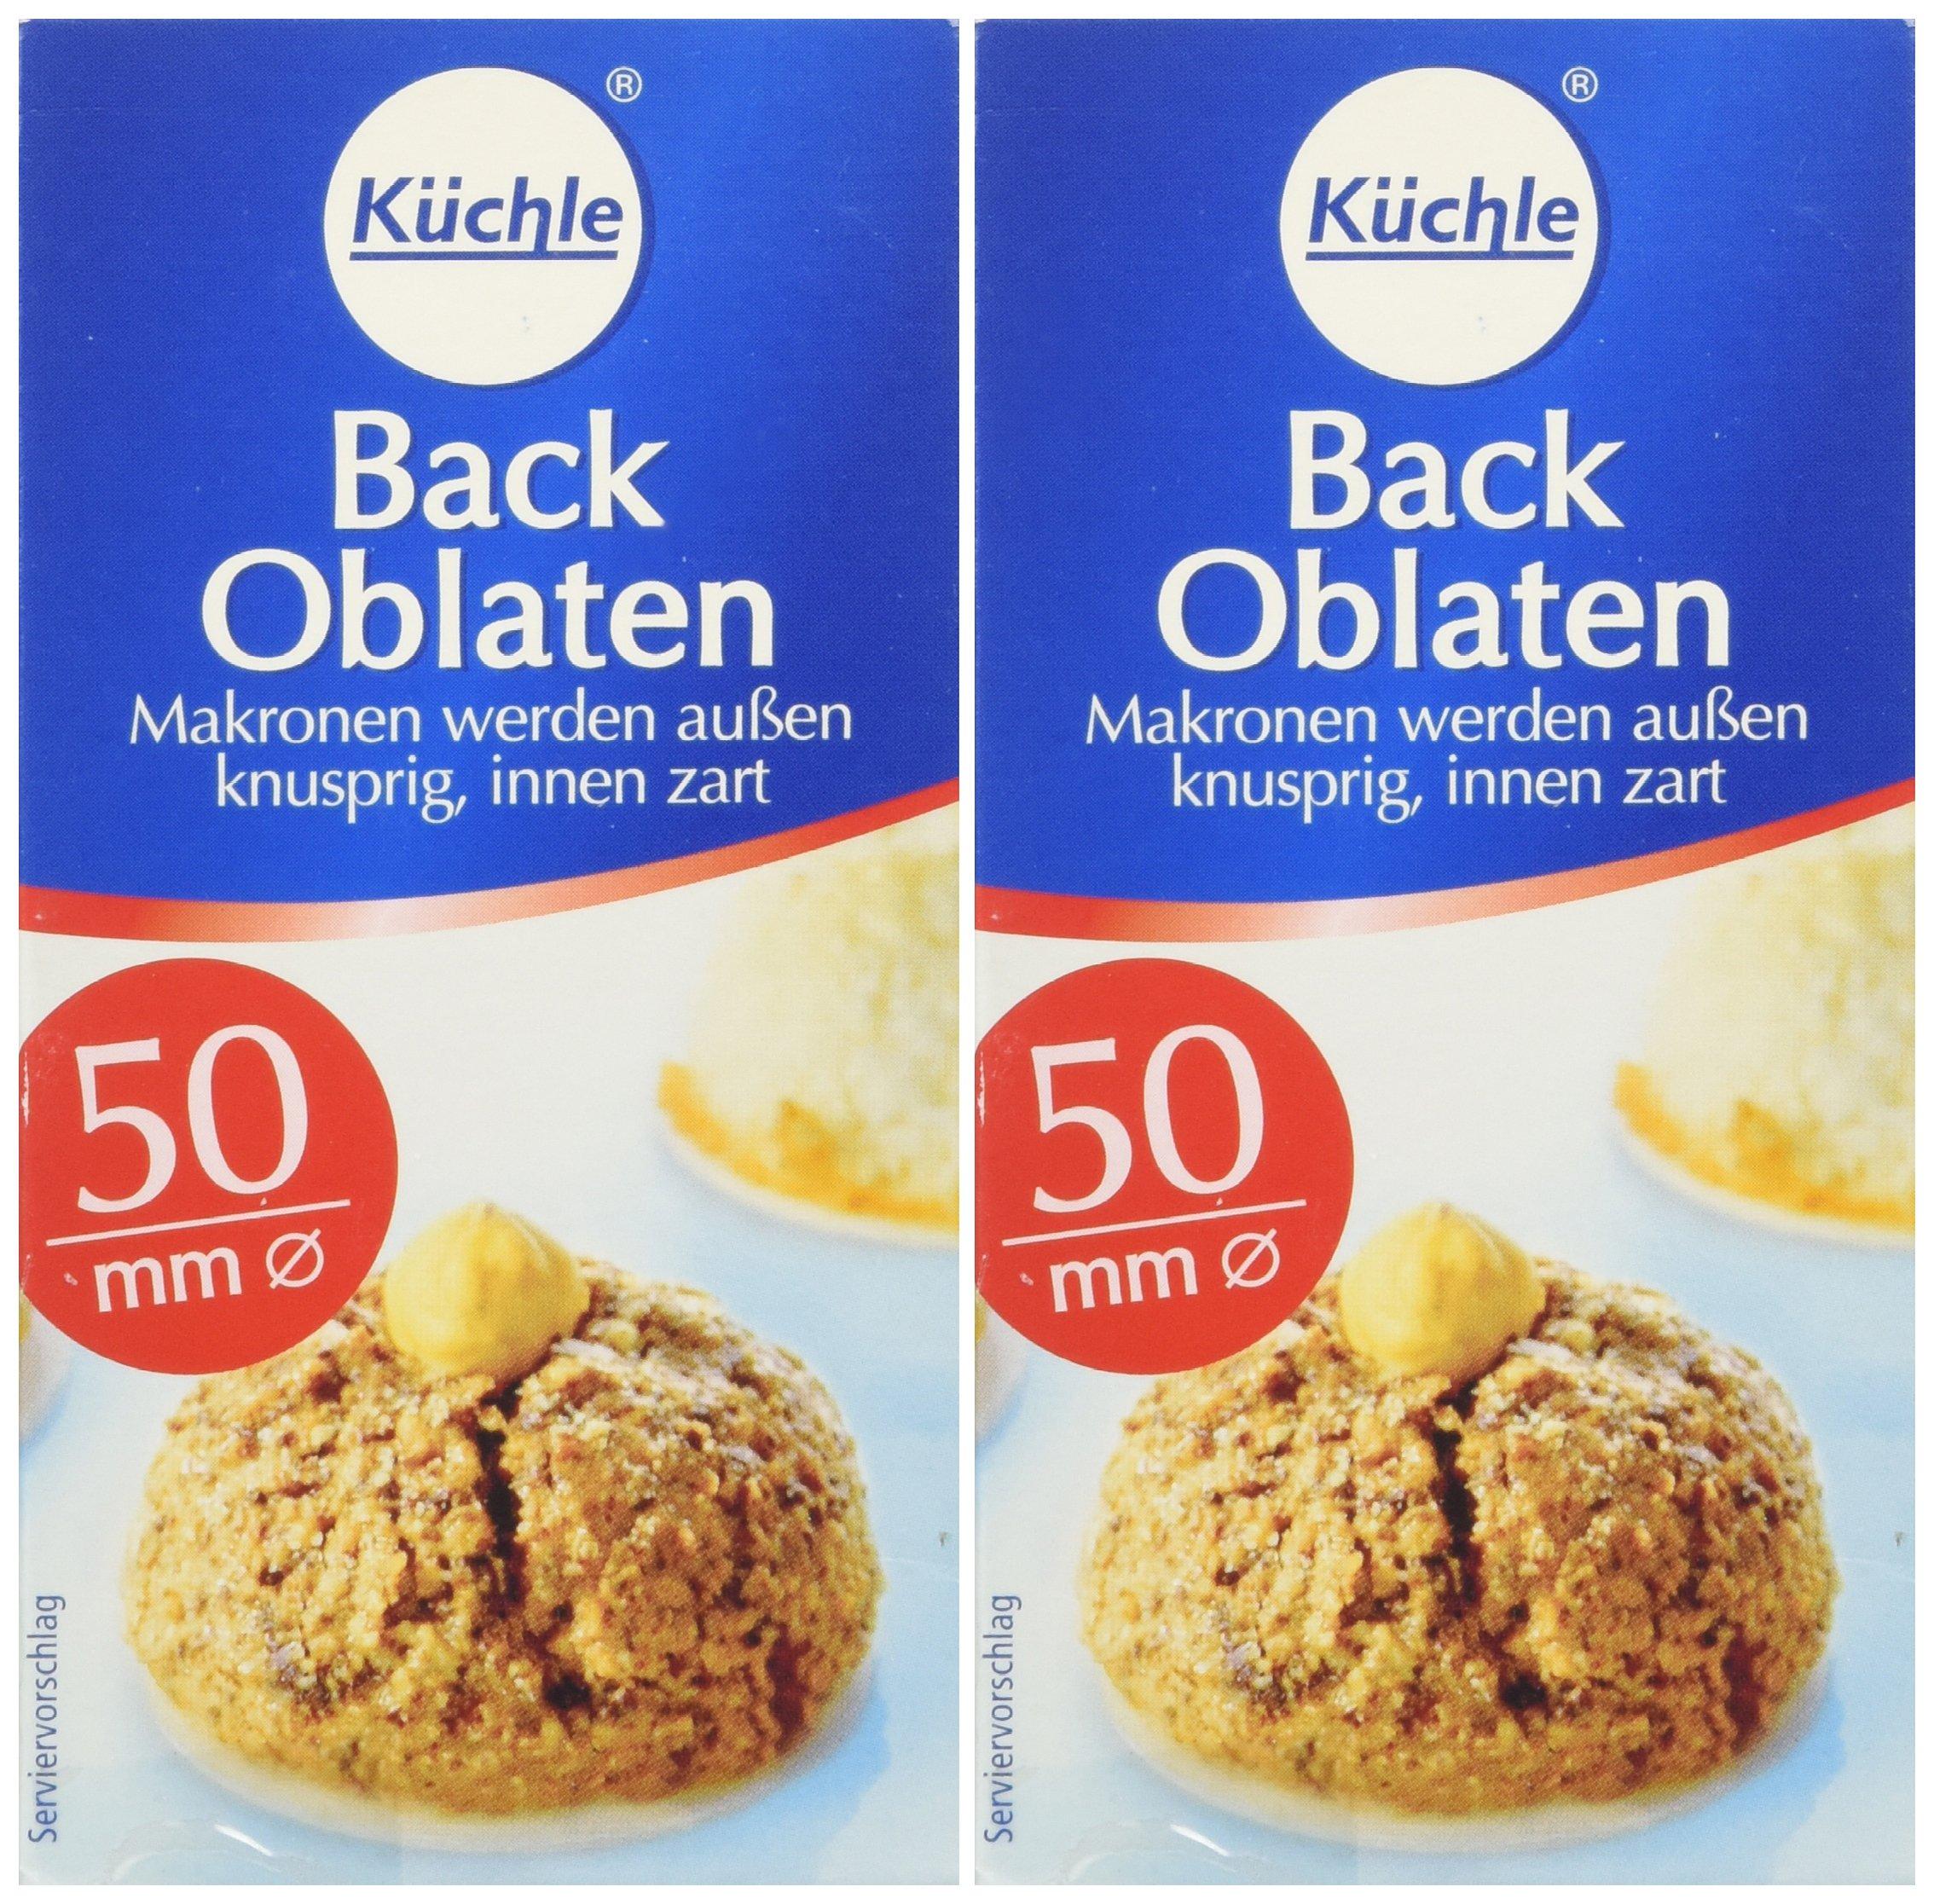 Kuchle Back Oblaten (2x37g/2x 1.30oz) Pack of 2